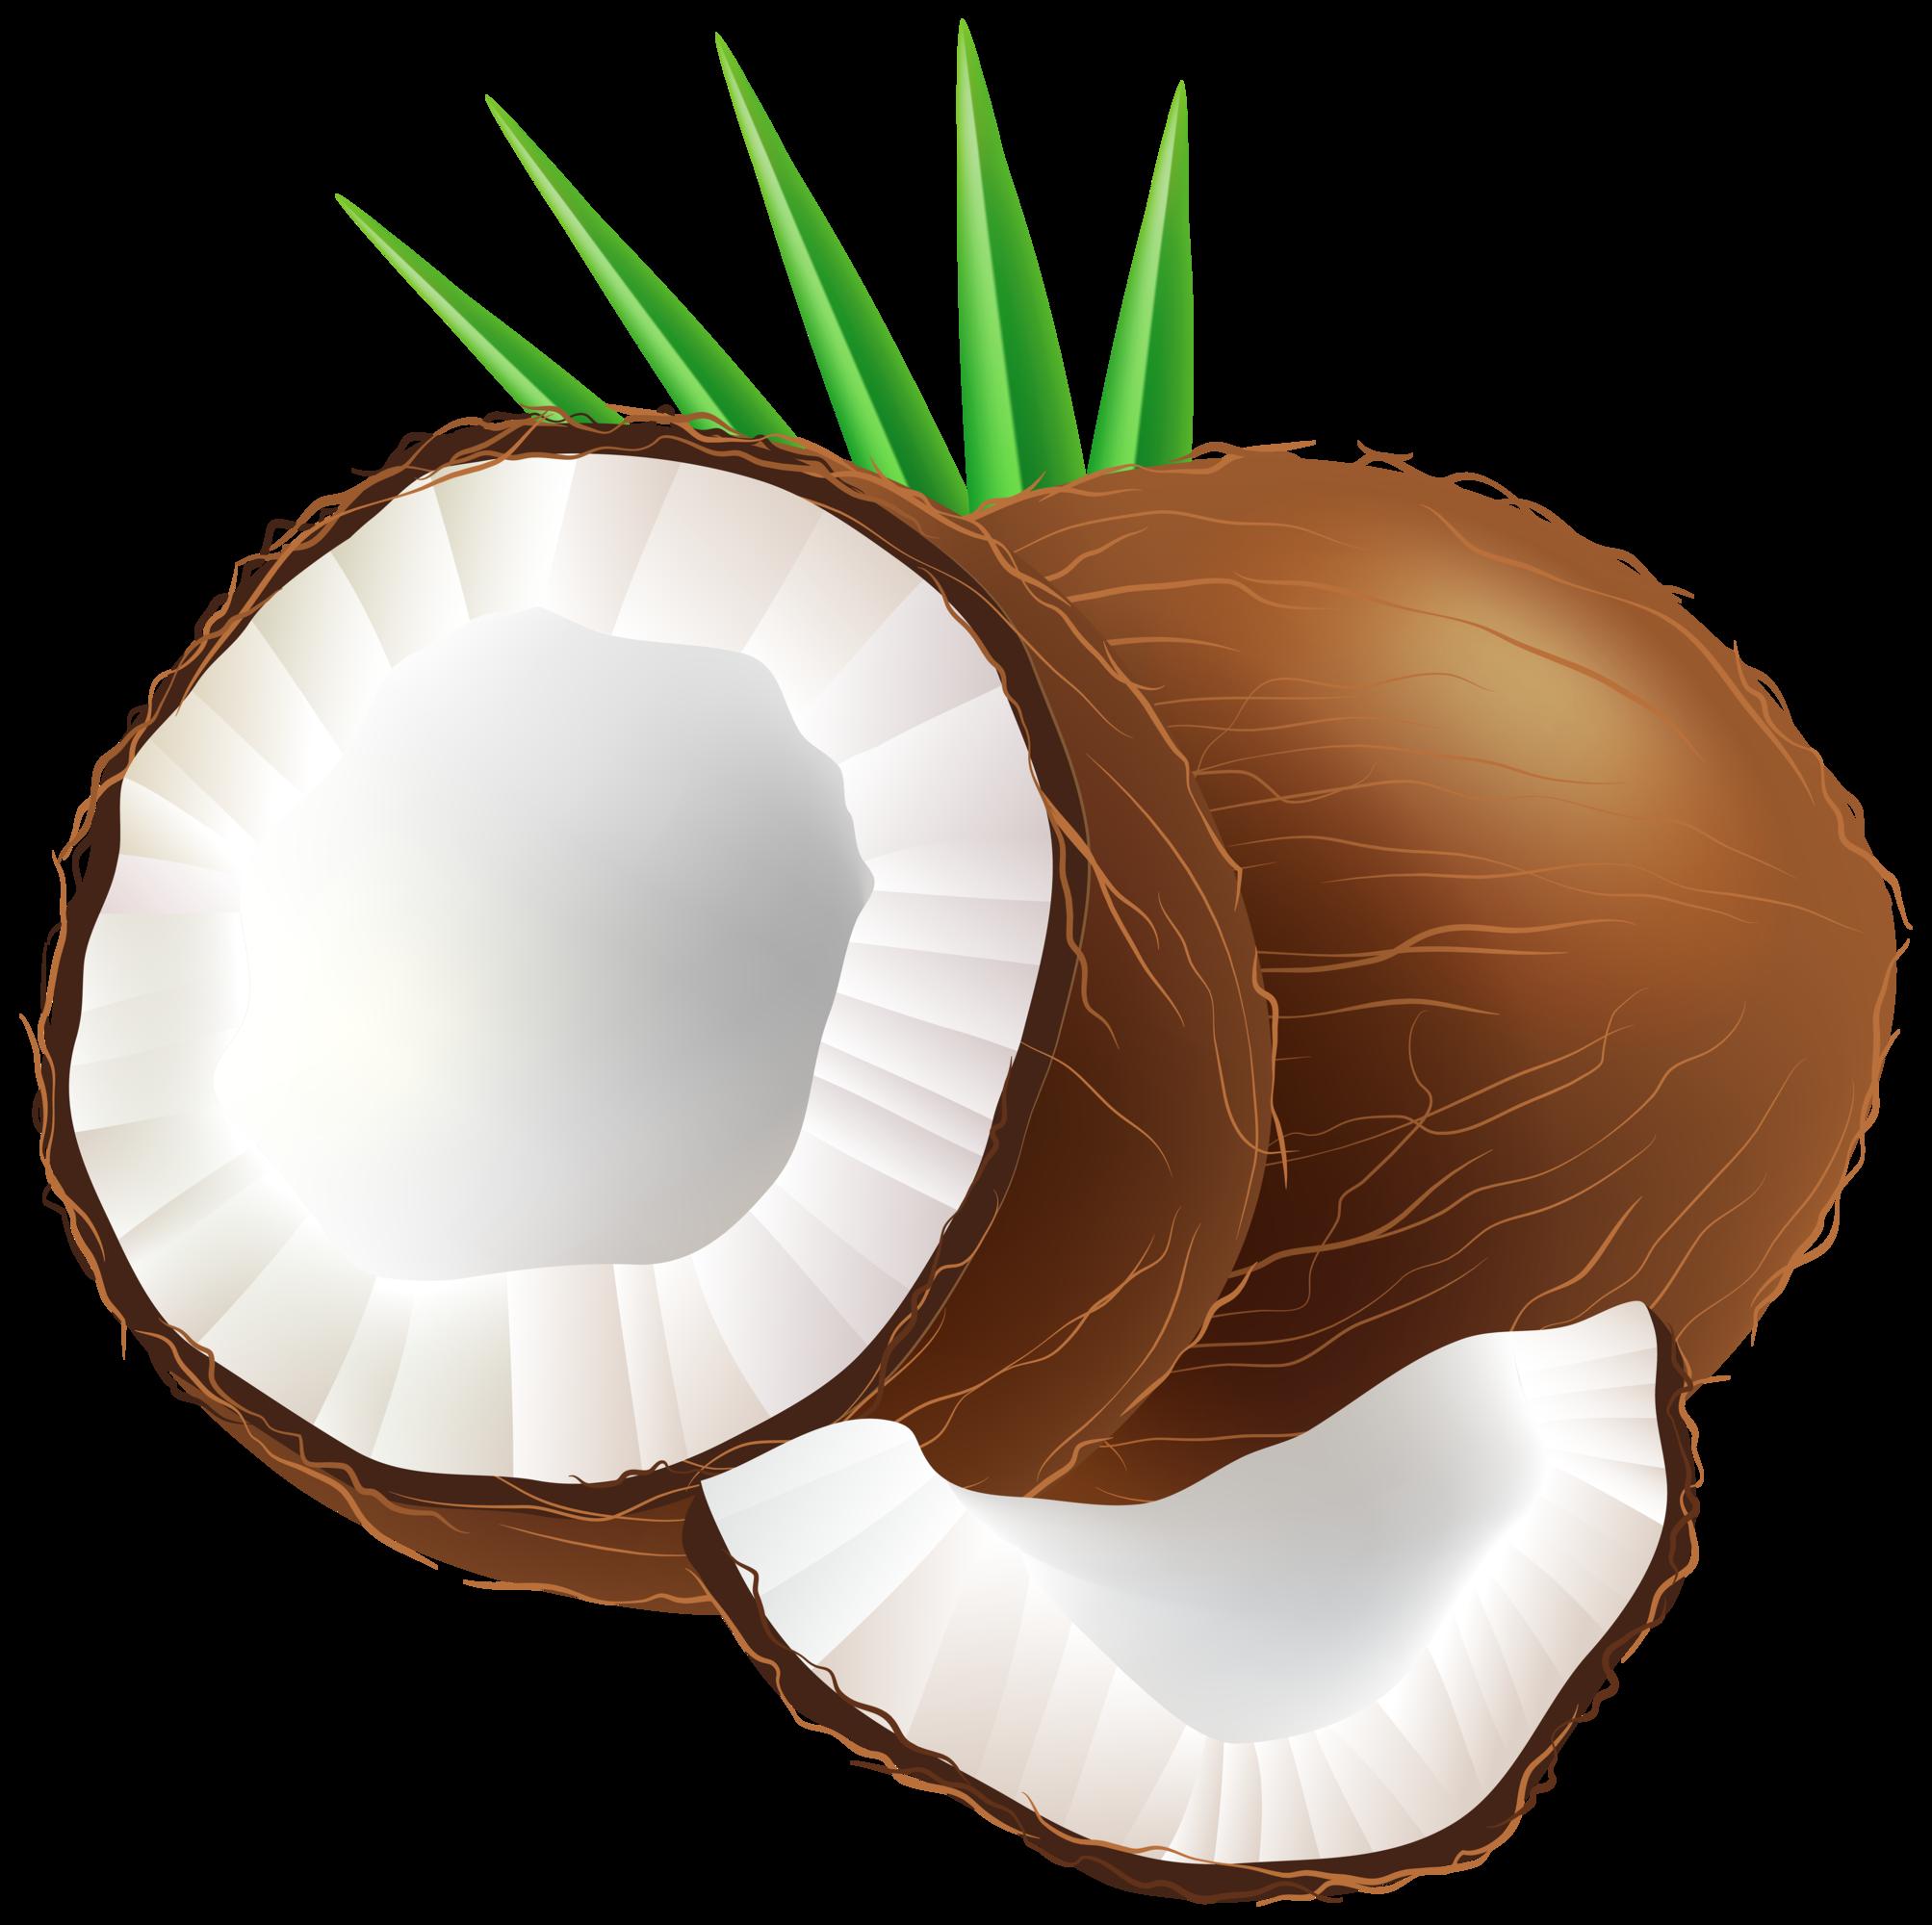 coconut png clip art rh clipart info coconut clip art black and white coconut tree clipart png